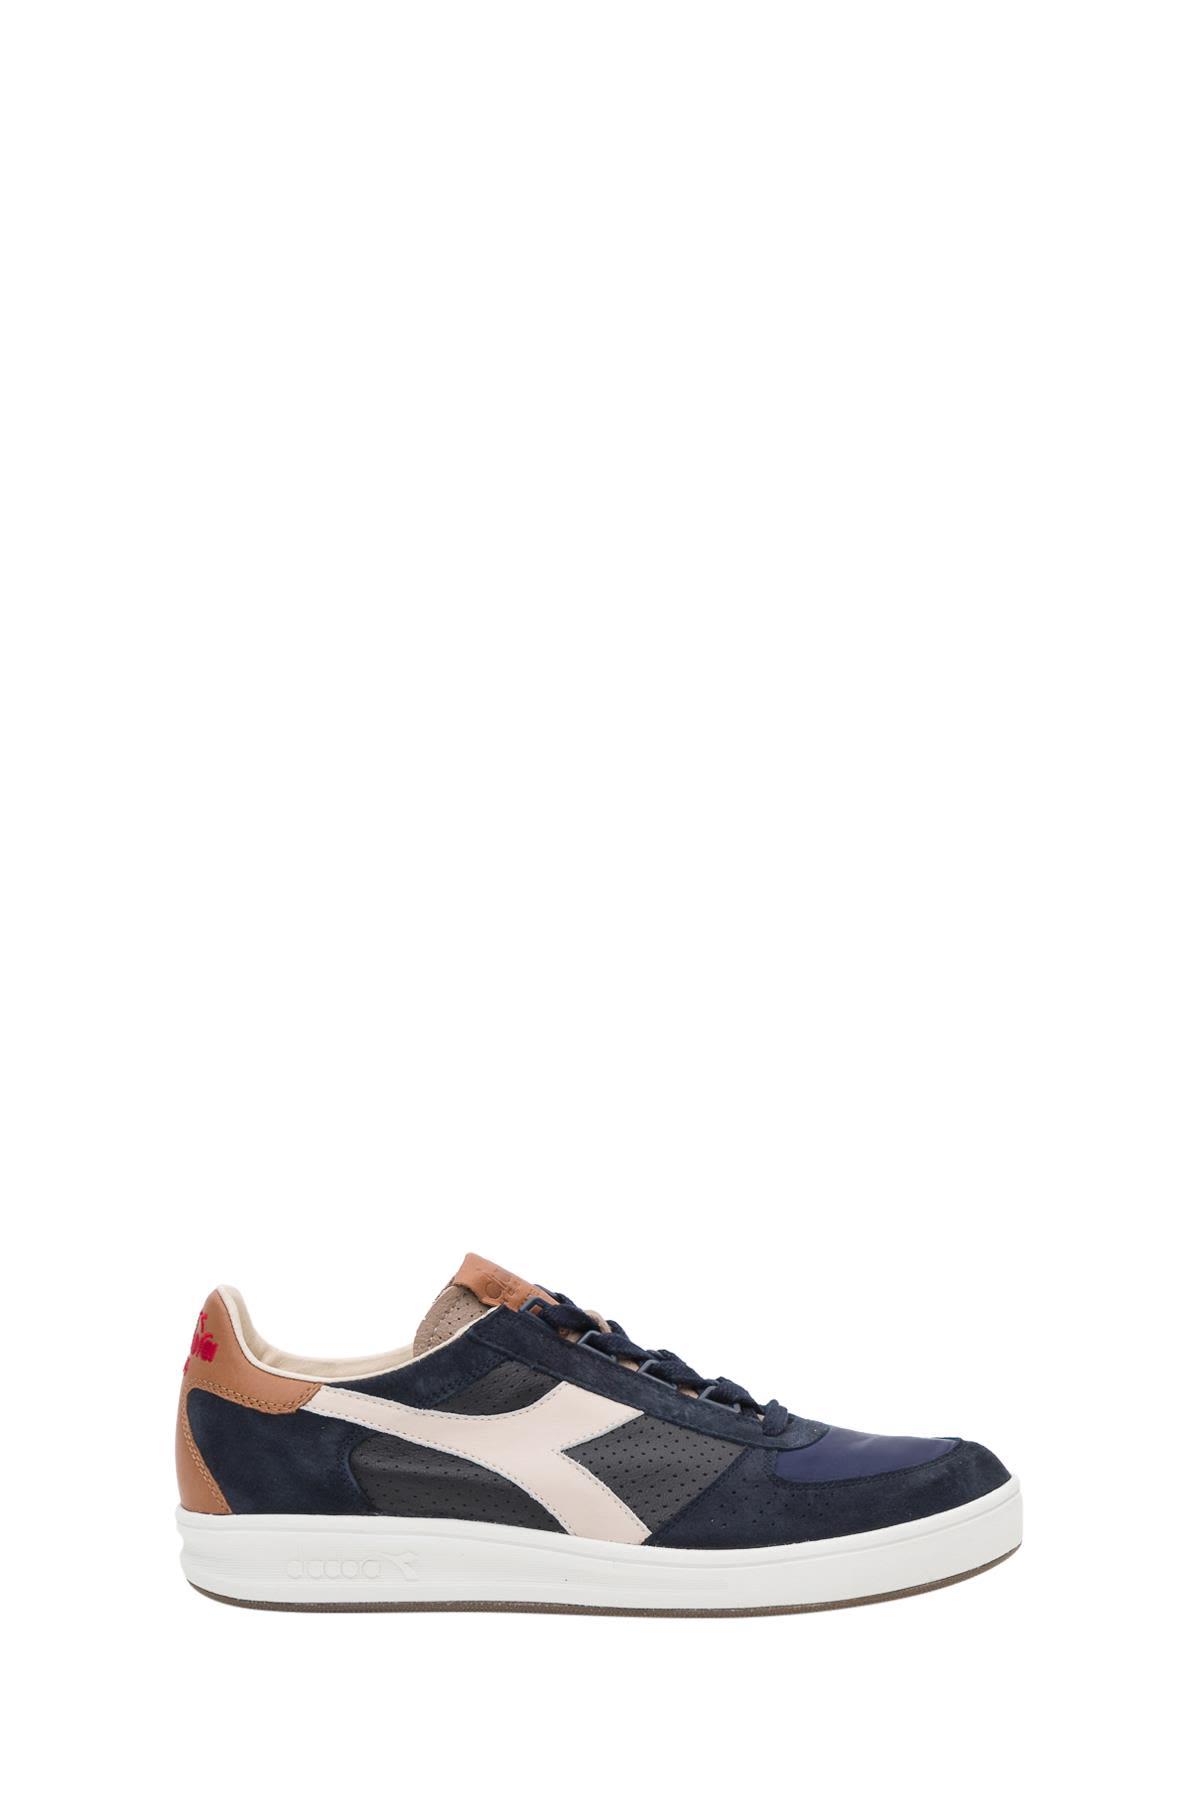 DIADORA B.Elite 173363 Sneakers in Blue